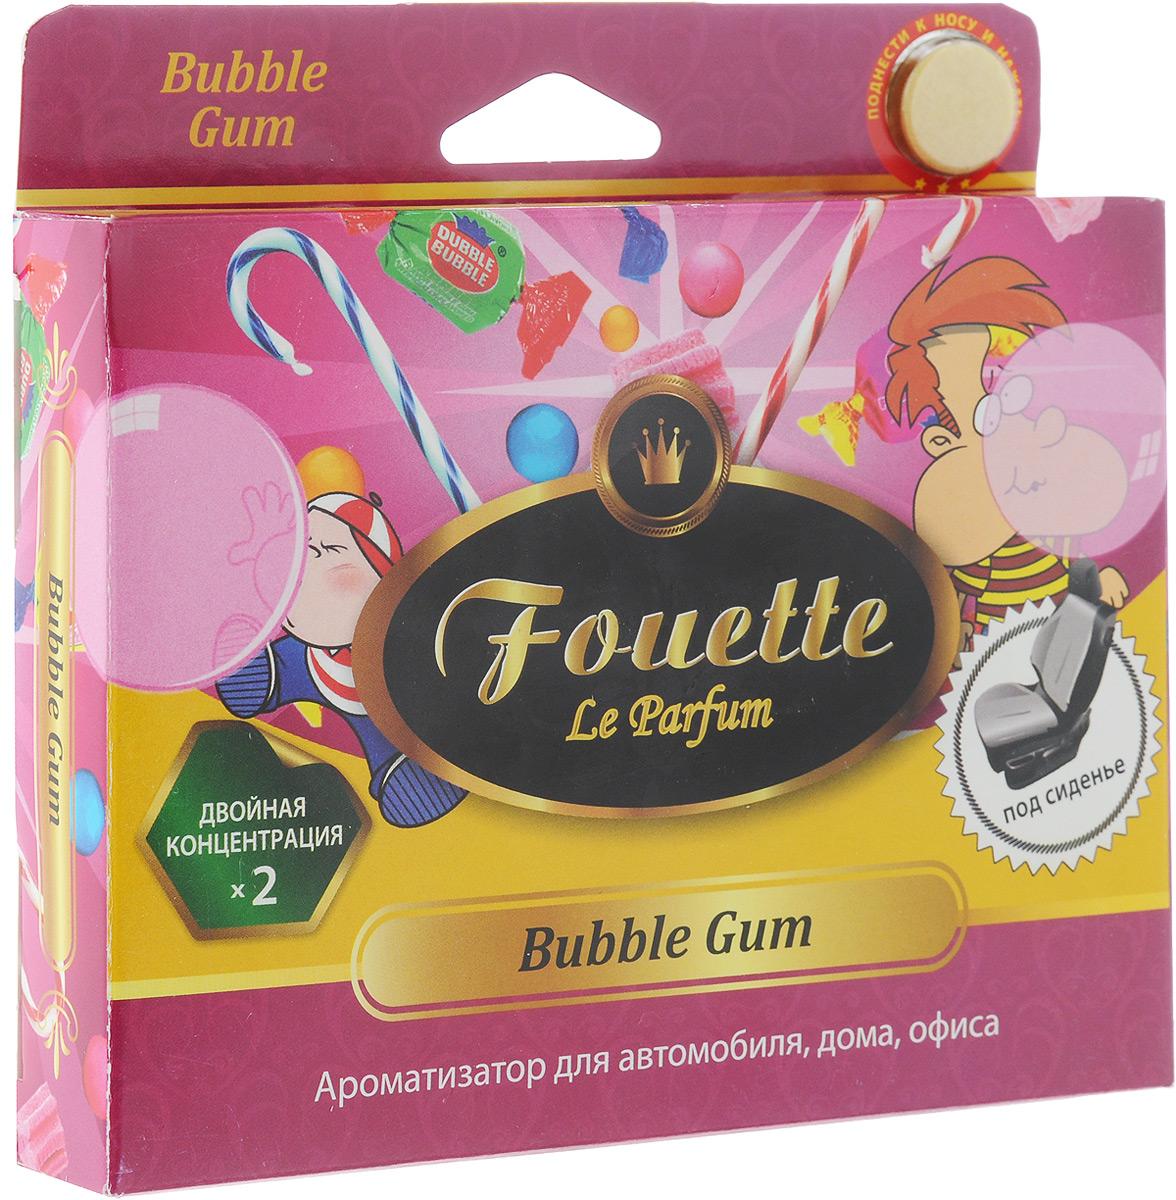 Ароматизатор для автомобиля Fouette Collection Aromatique. Bubble Gum, под сиденье, 200 г ароматизатор воздуха f 15 лакомый нектар под сиденье двойной концентрации 200 мл fouette